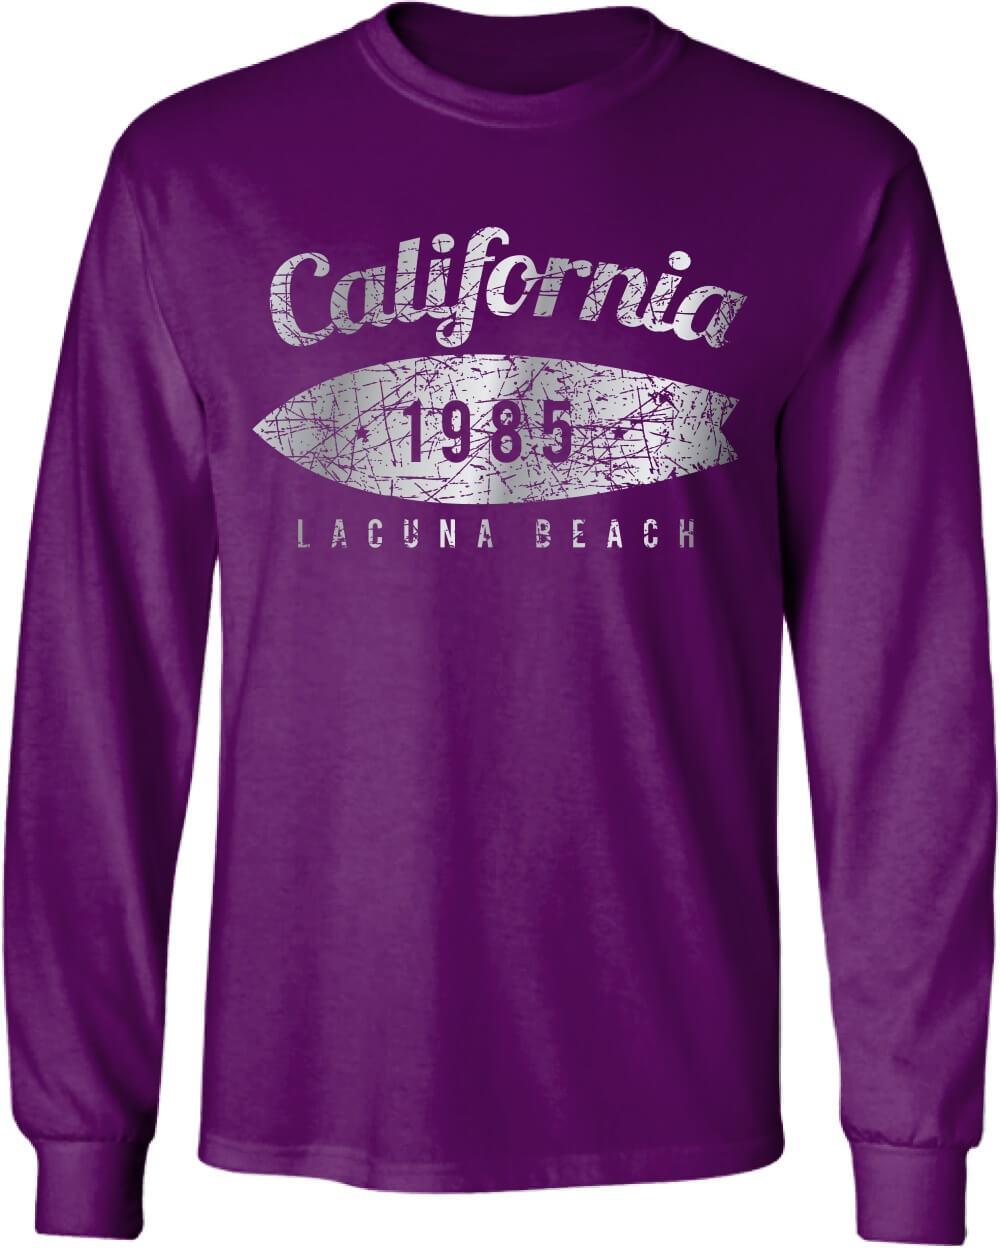 Shirt design tampa - Silver Foil